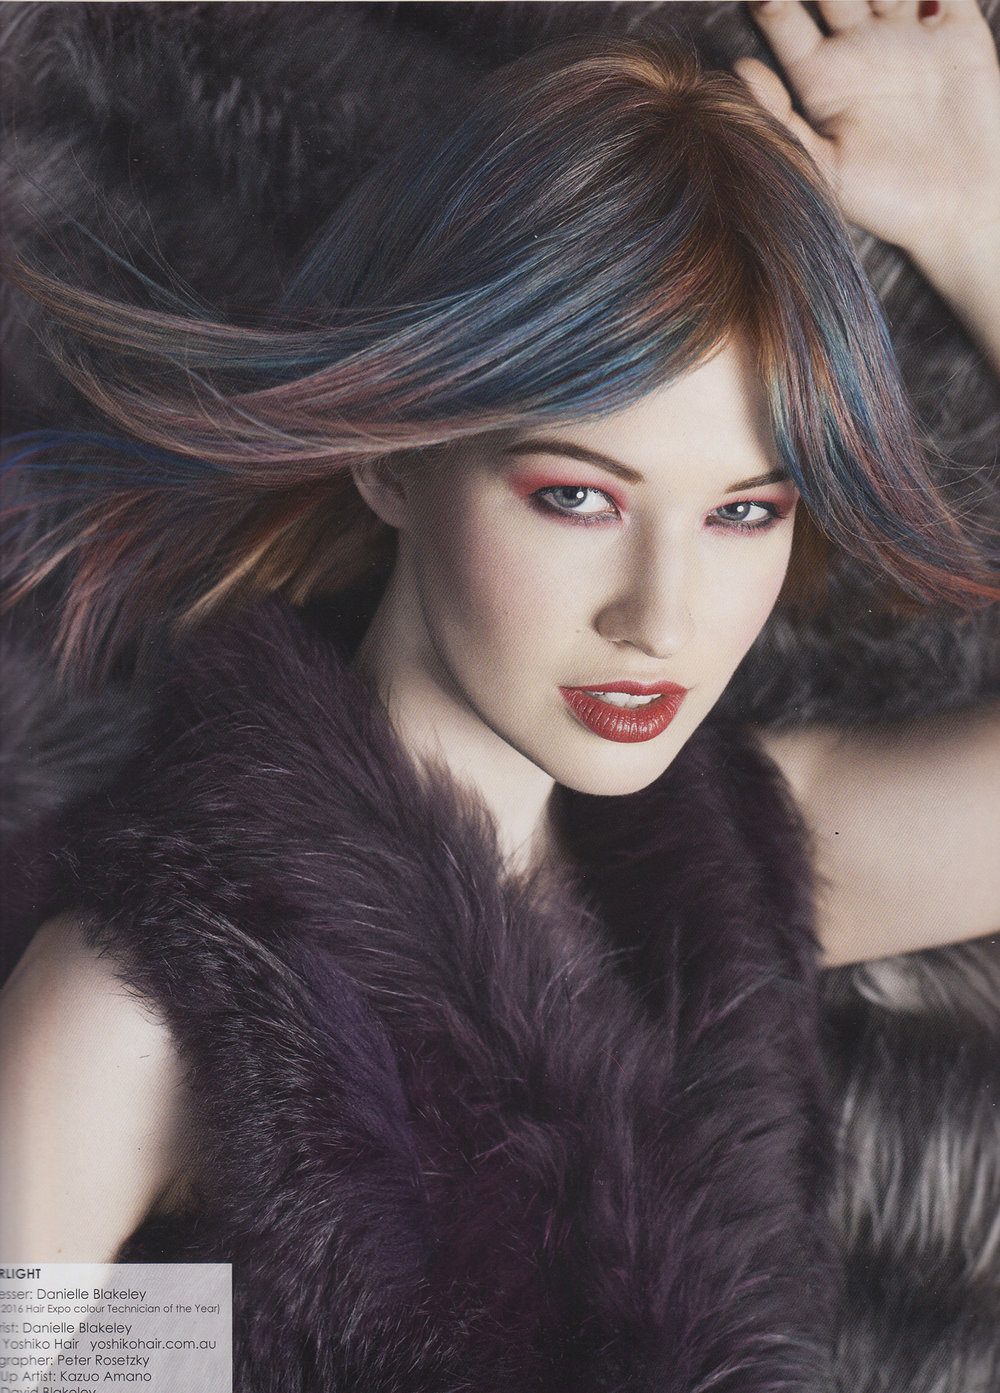 yoshikohair_stkilda_melbourne_hairdresser_hairsalon_trend17_4